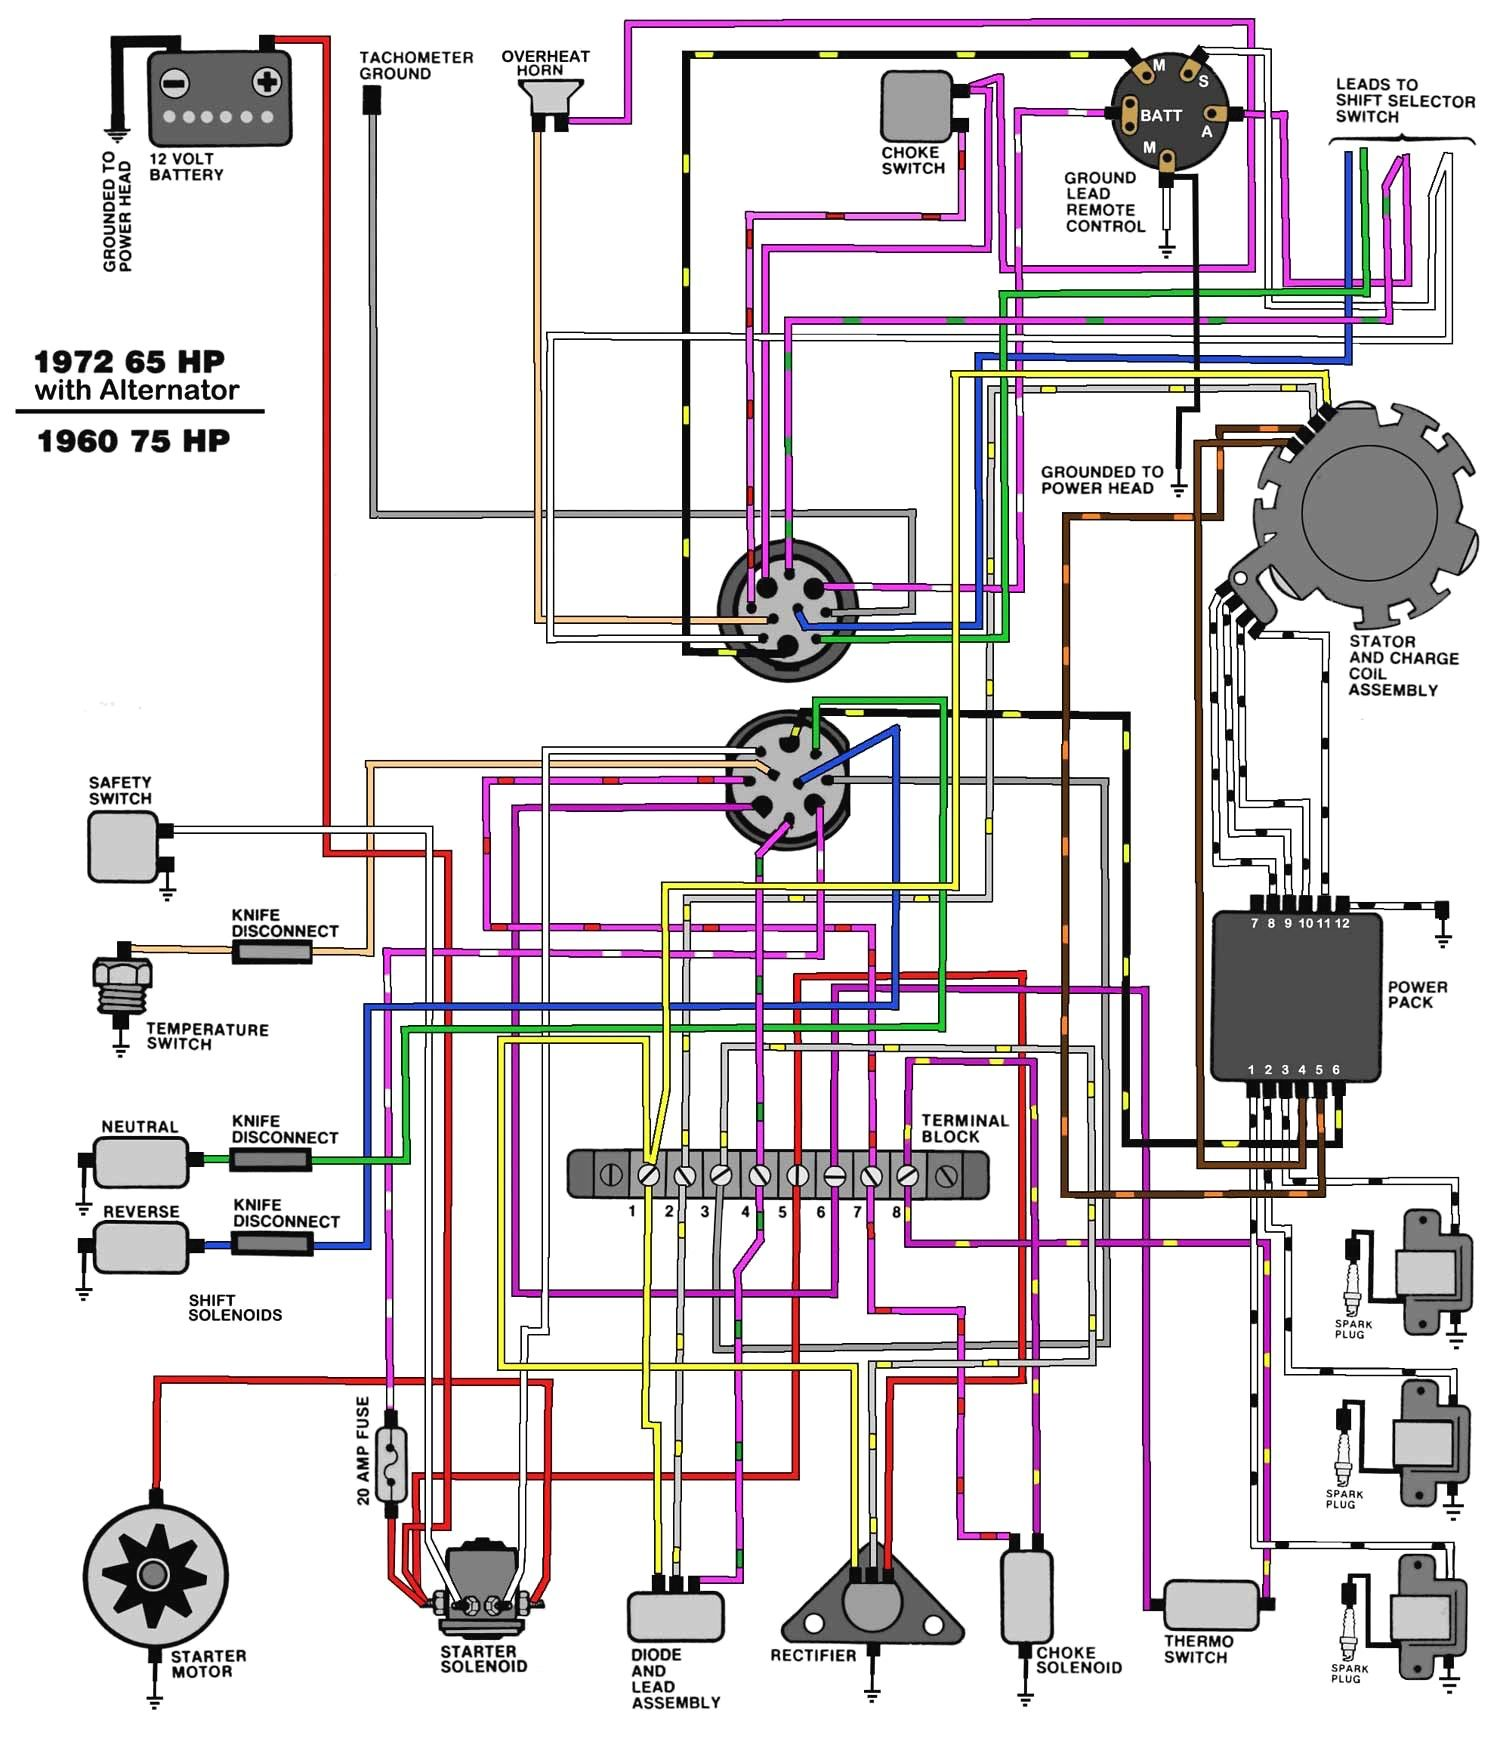 65 hp mercury outboard motor wiring diagram diagrams schematics for [ 1500 x 1763 Pixel ]